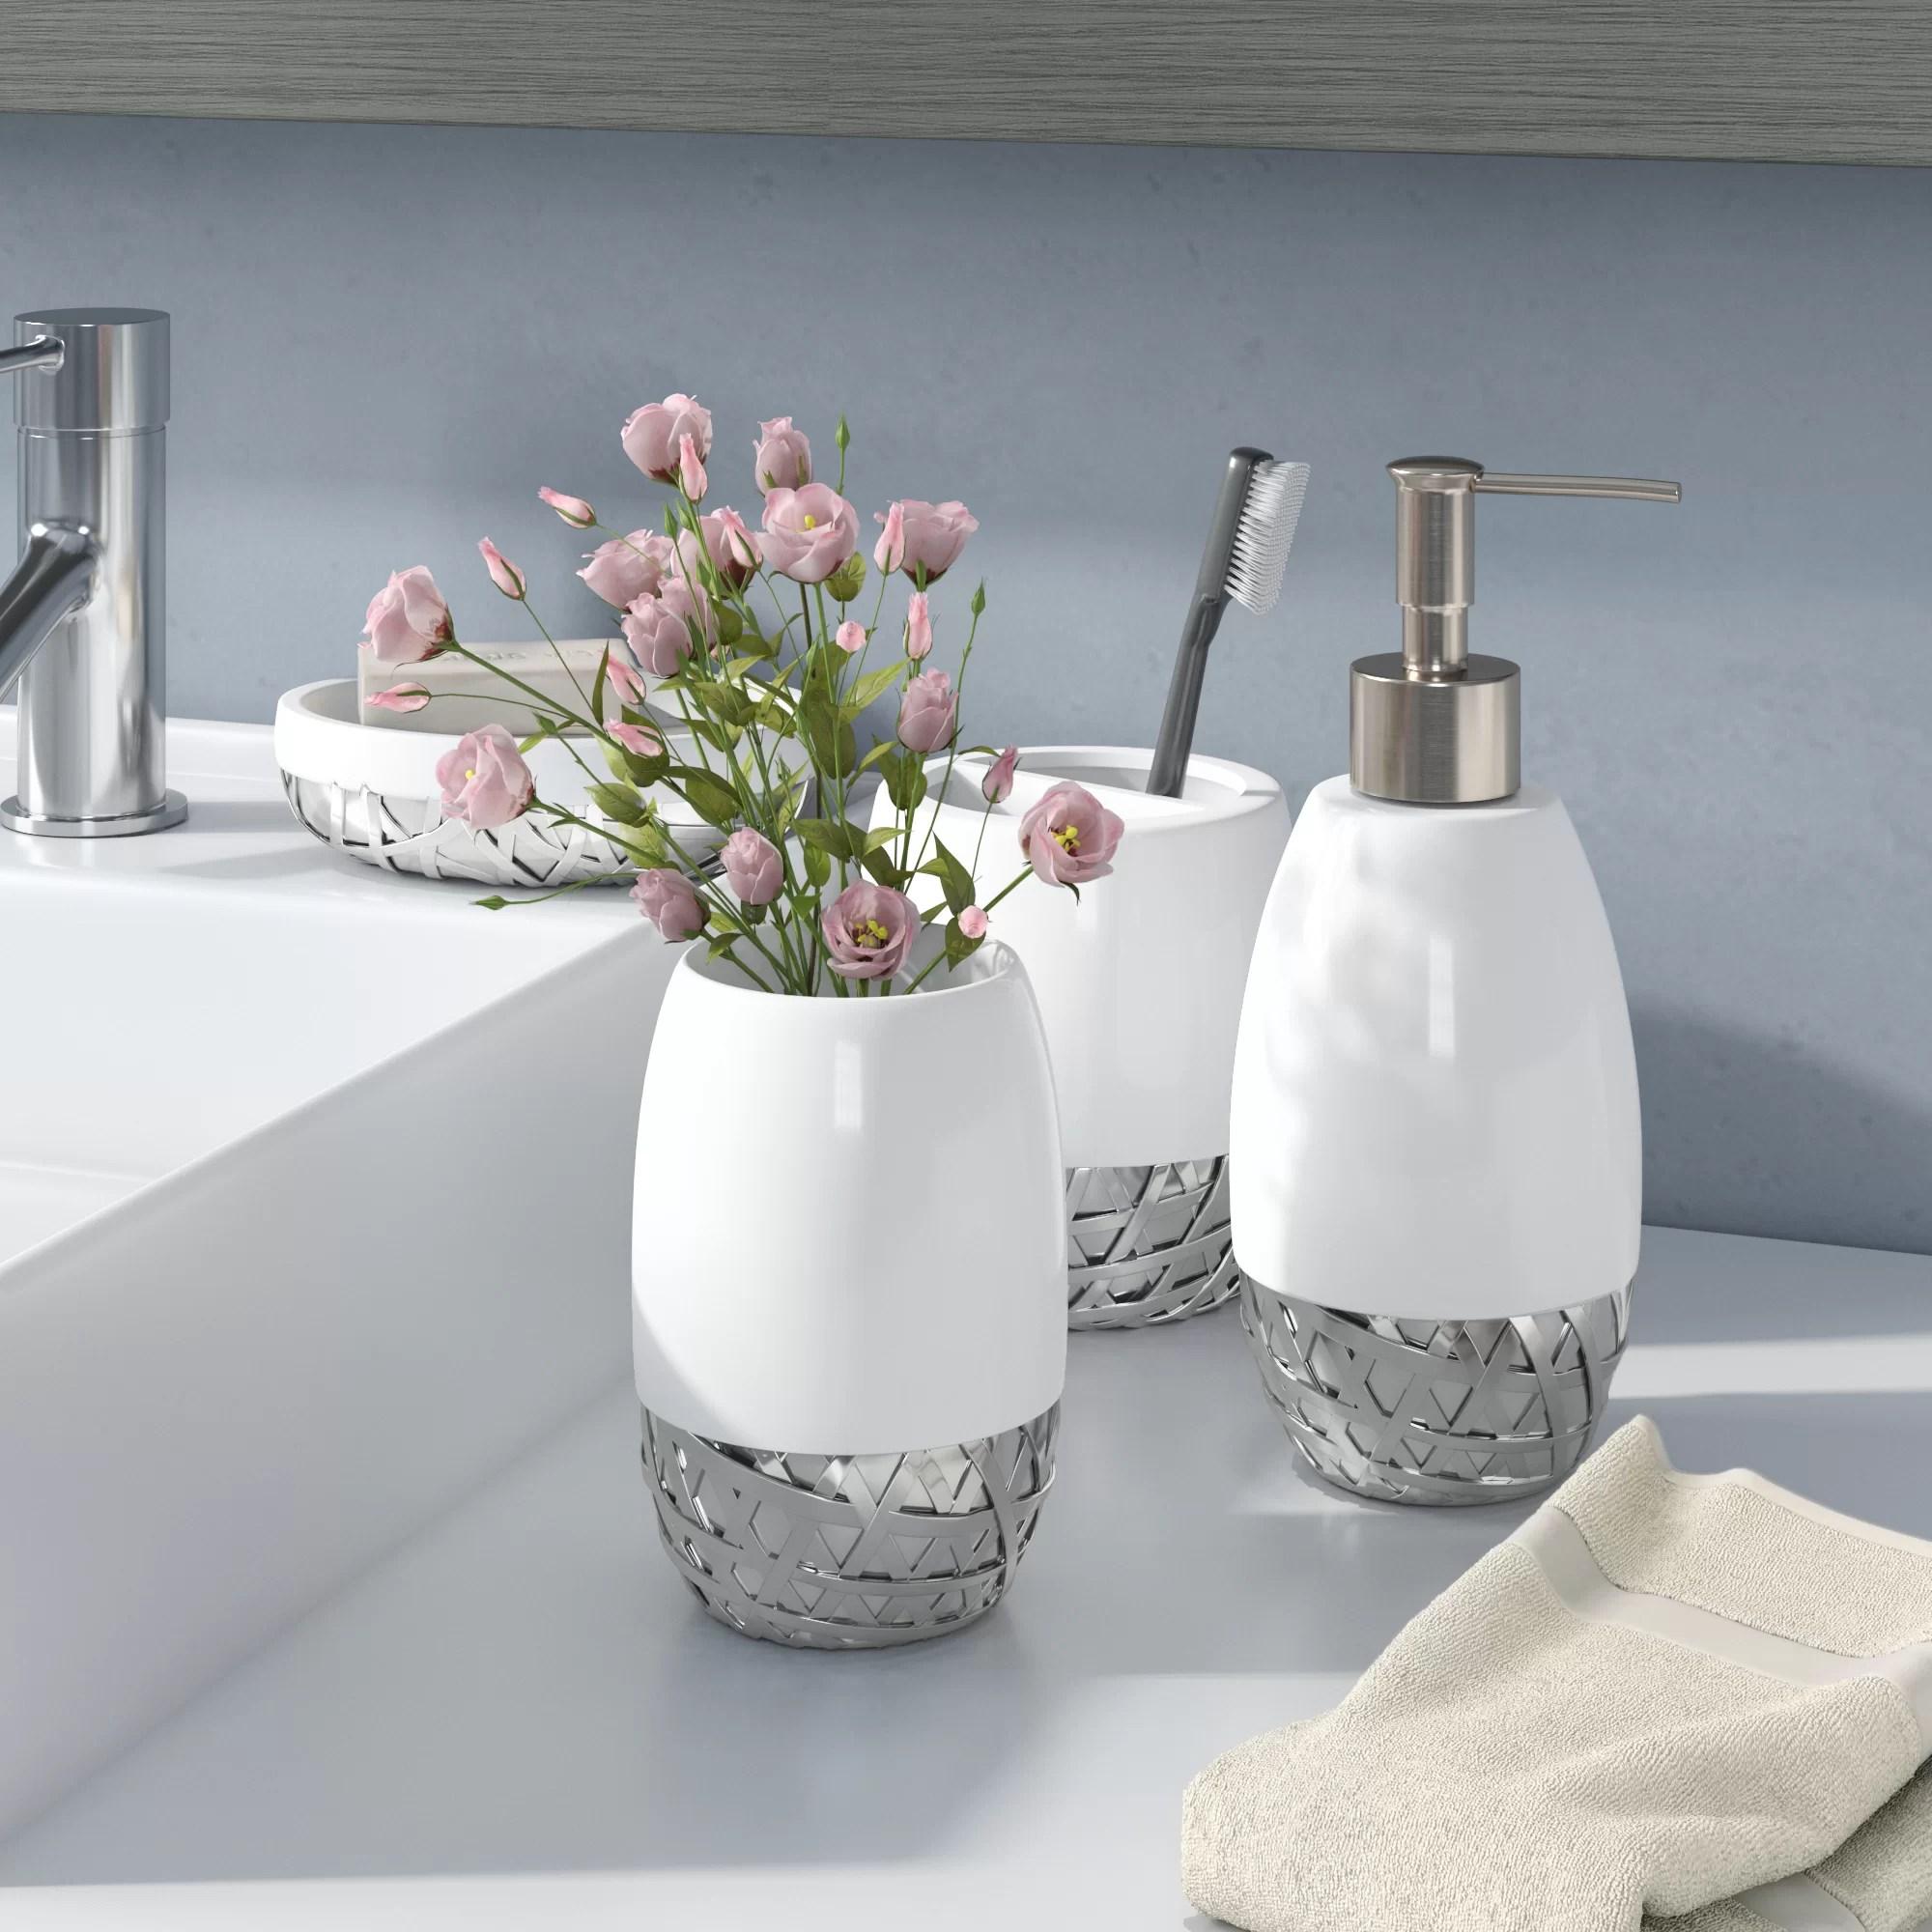 Orren Ellis Stiltner 4 Piece Bathroom Accessory Set Reviews Wayfair